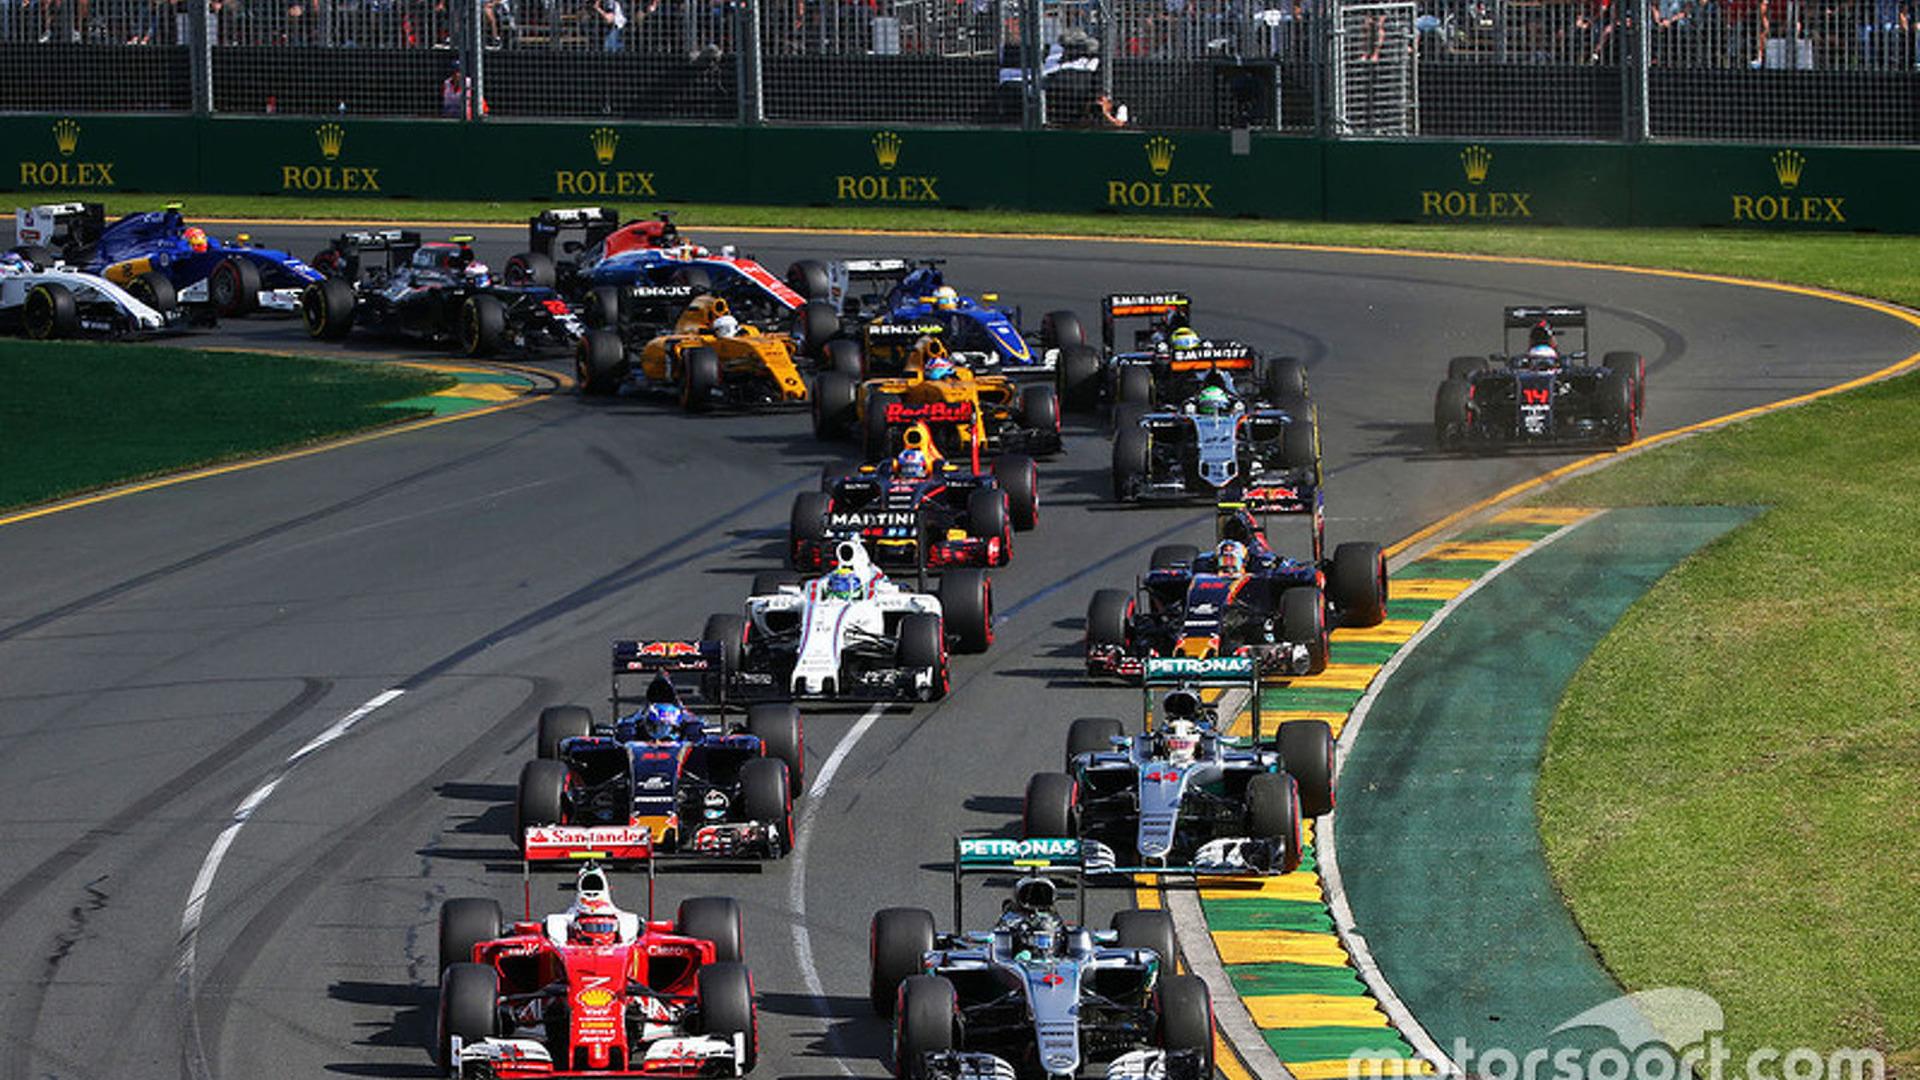 Australian GP: Rosberg wins season opener, Alonso's crash halts race